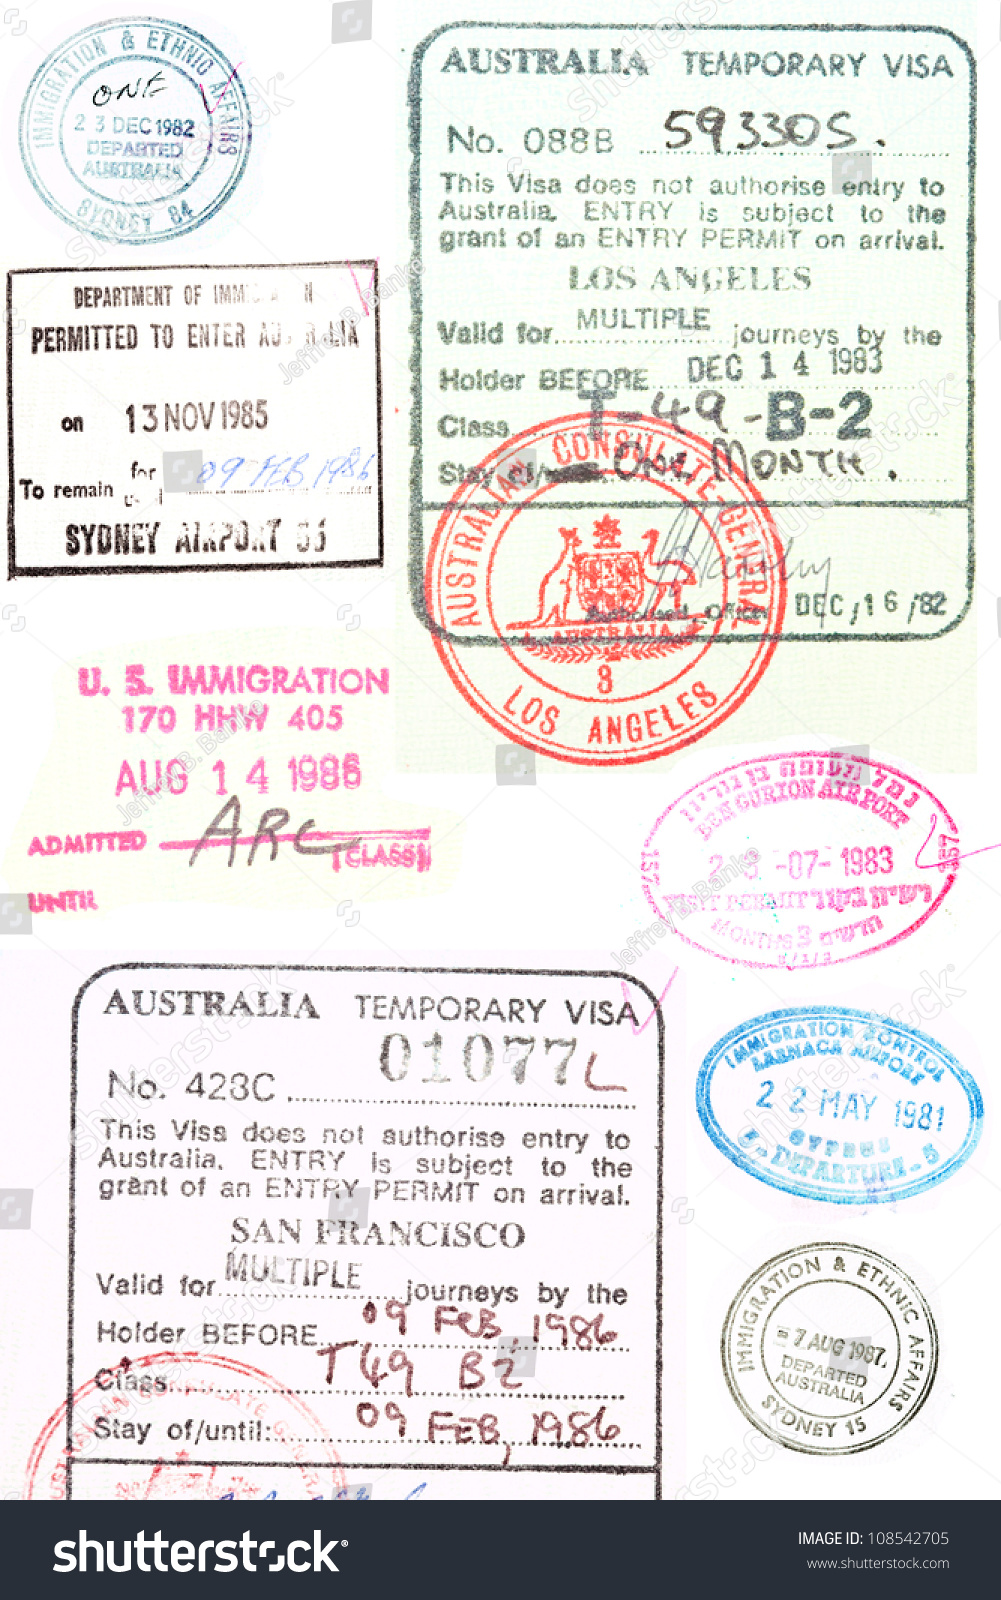 how to get visa in sydney australia